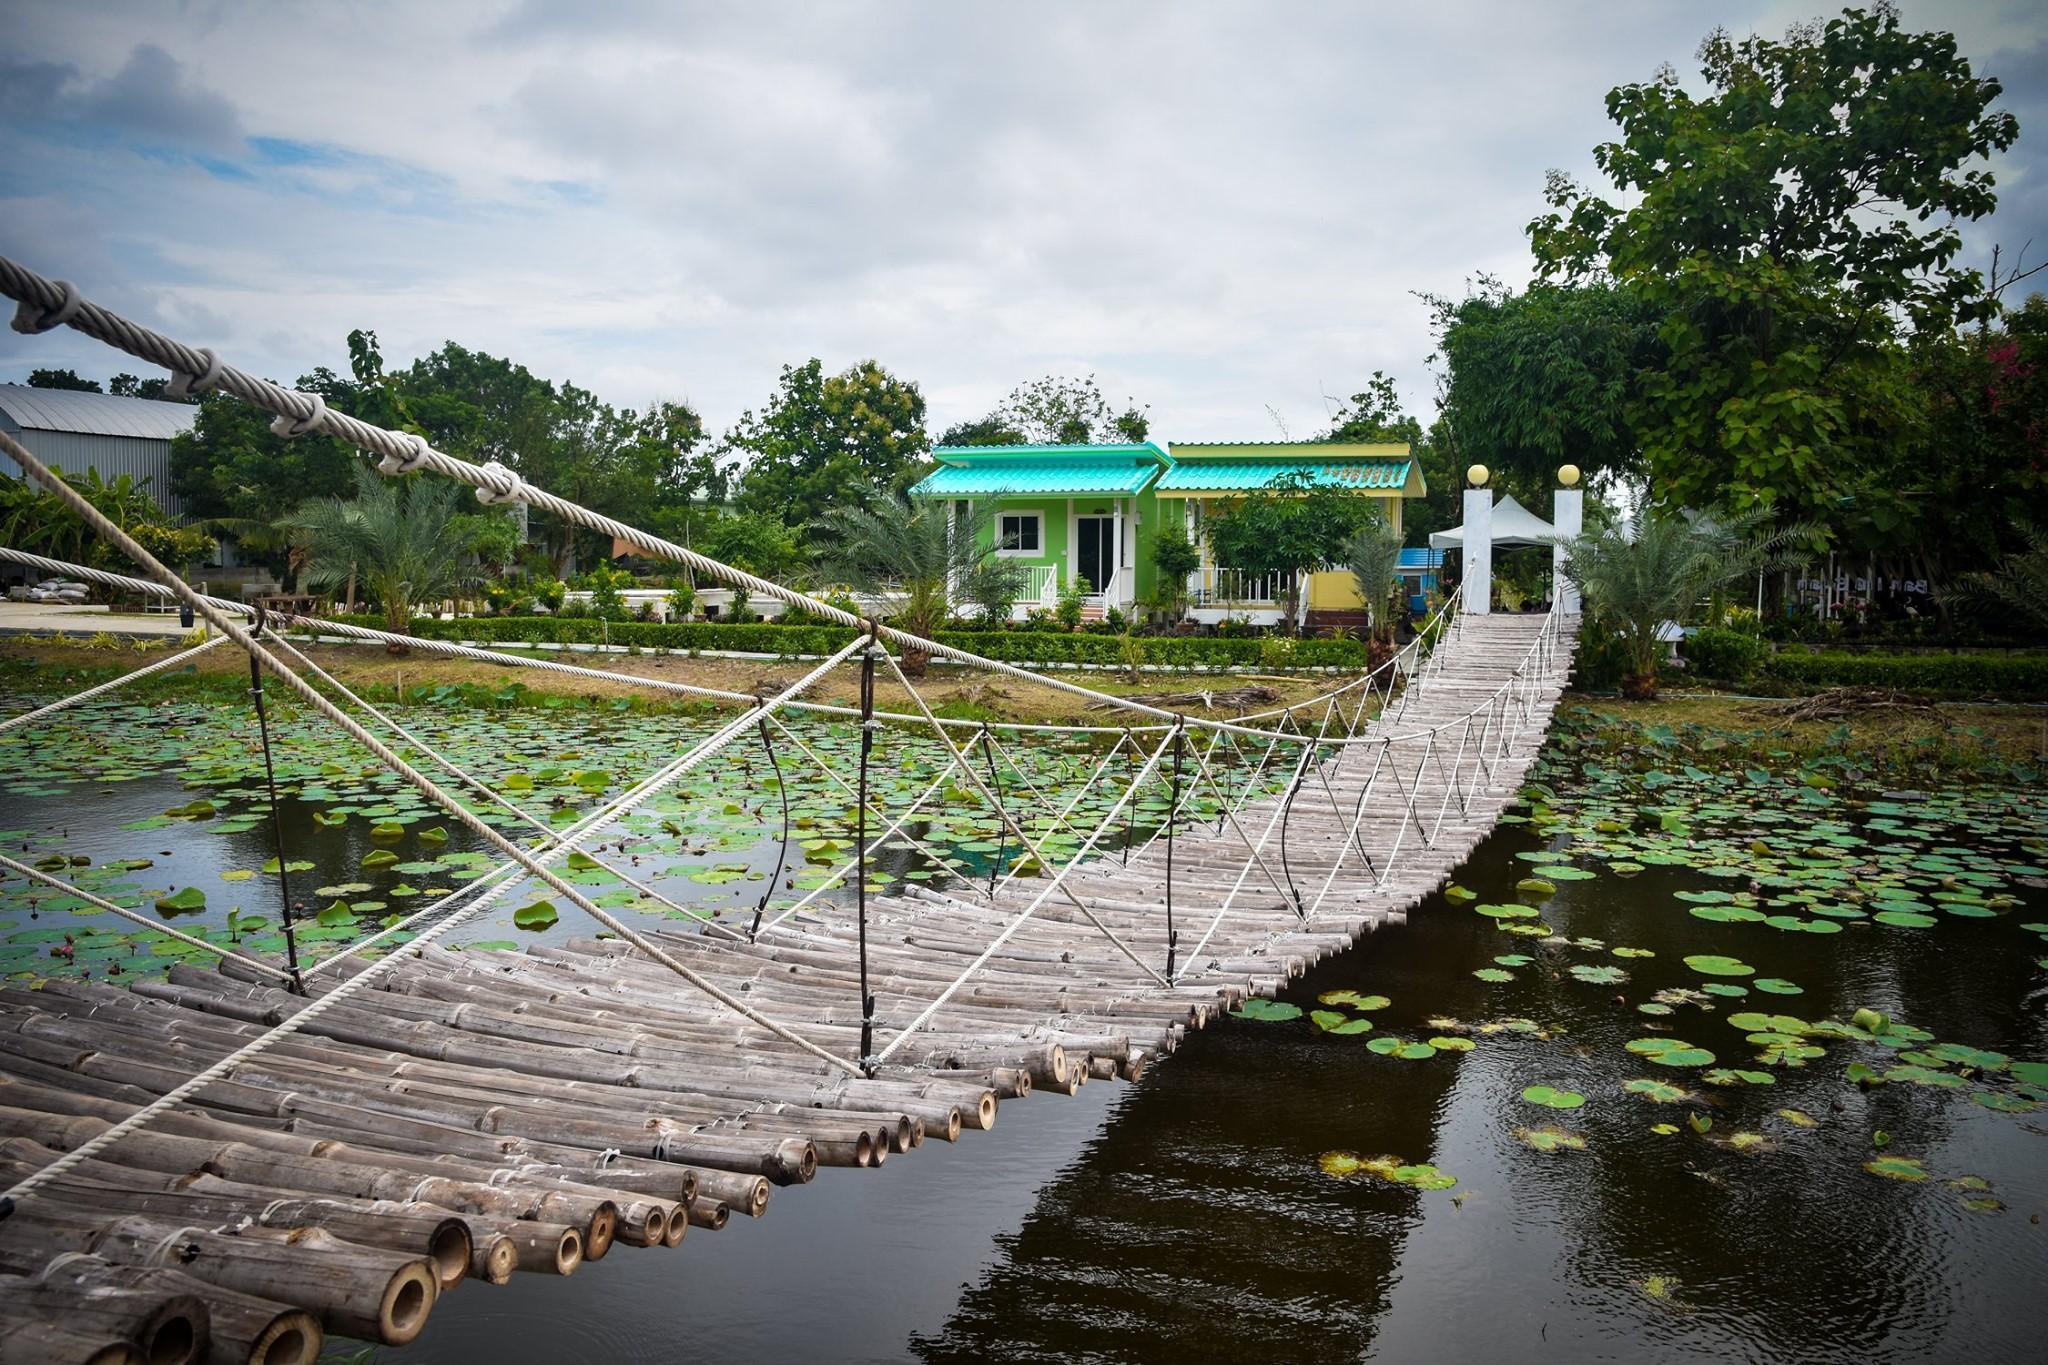 Ban Ing Suan Homestay Suvarnabhumi บังกะโล 2 ห้องนอน 1 ห้องน้ำส่วนตัว ขนาด 28 ตร.ม. – สนามบินสุวรรณภูมิ